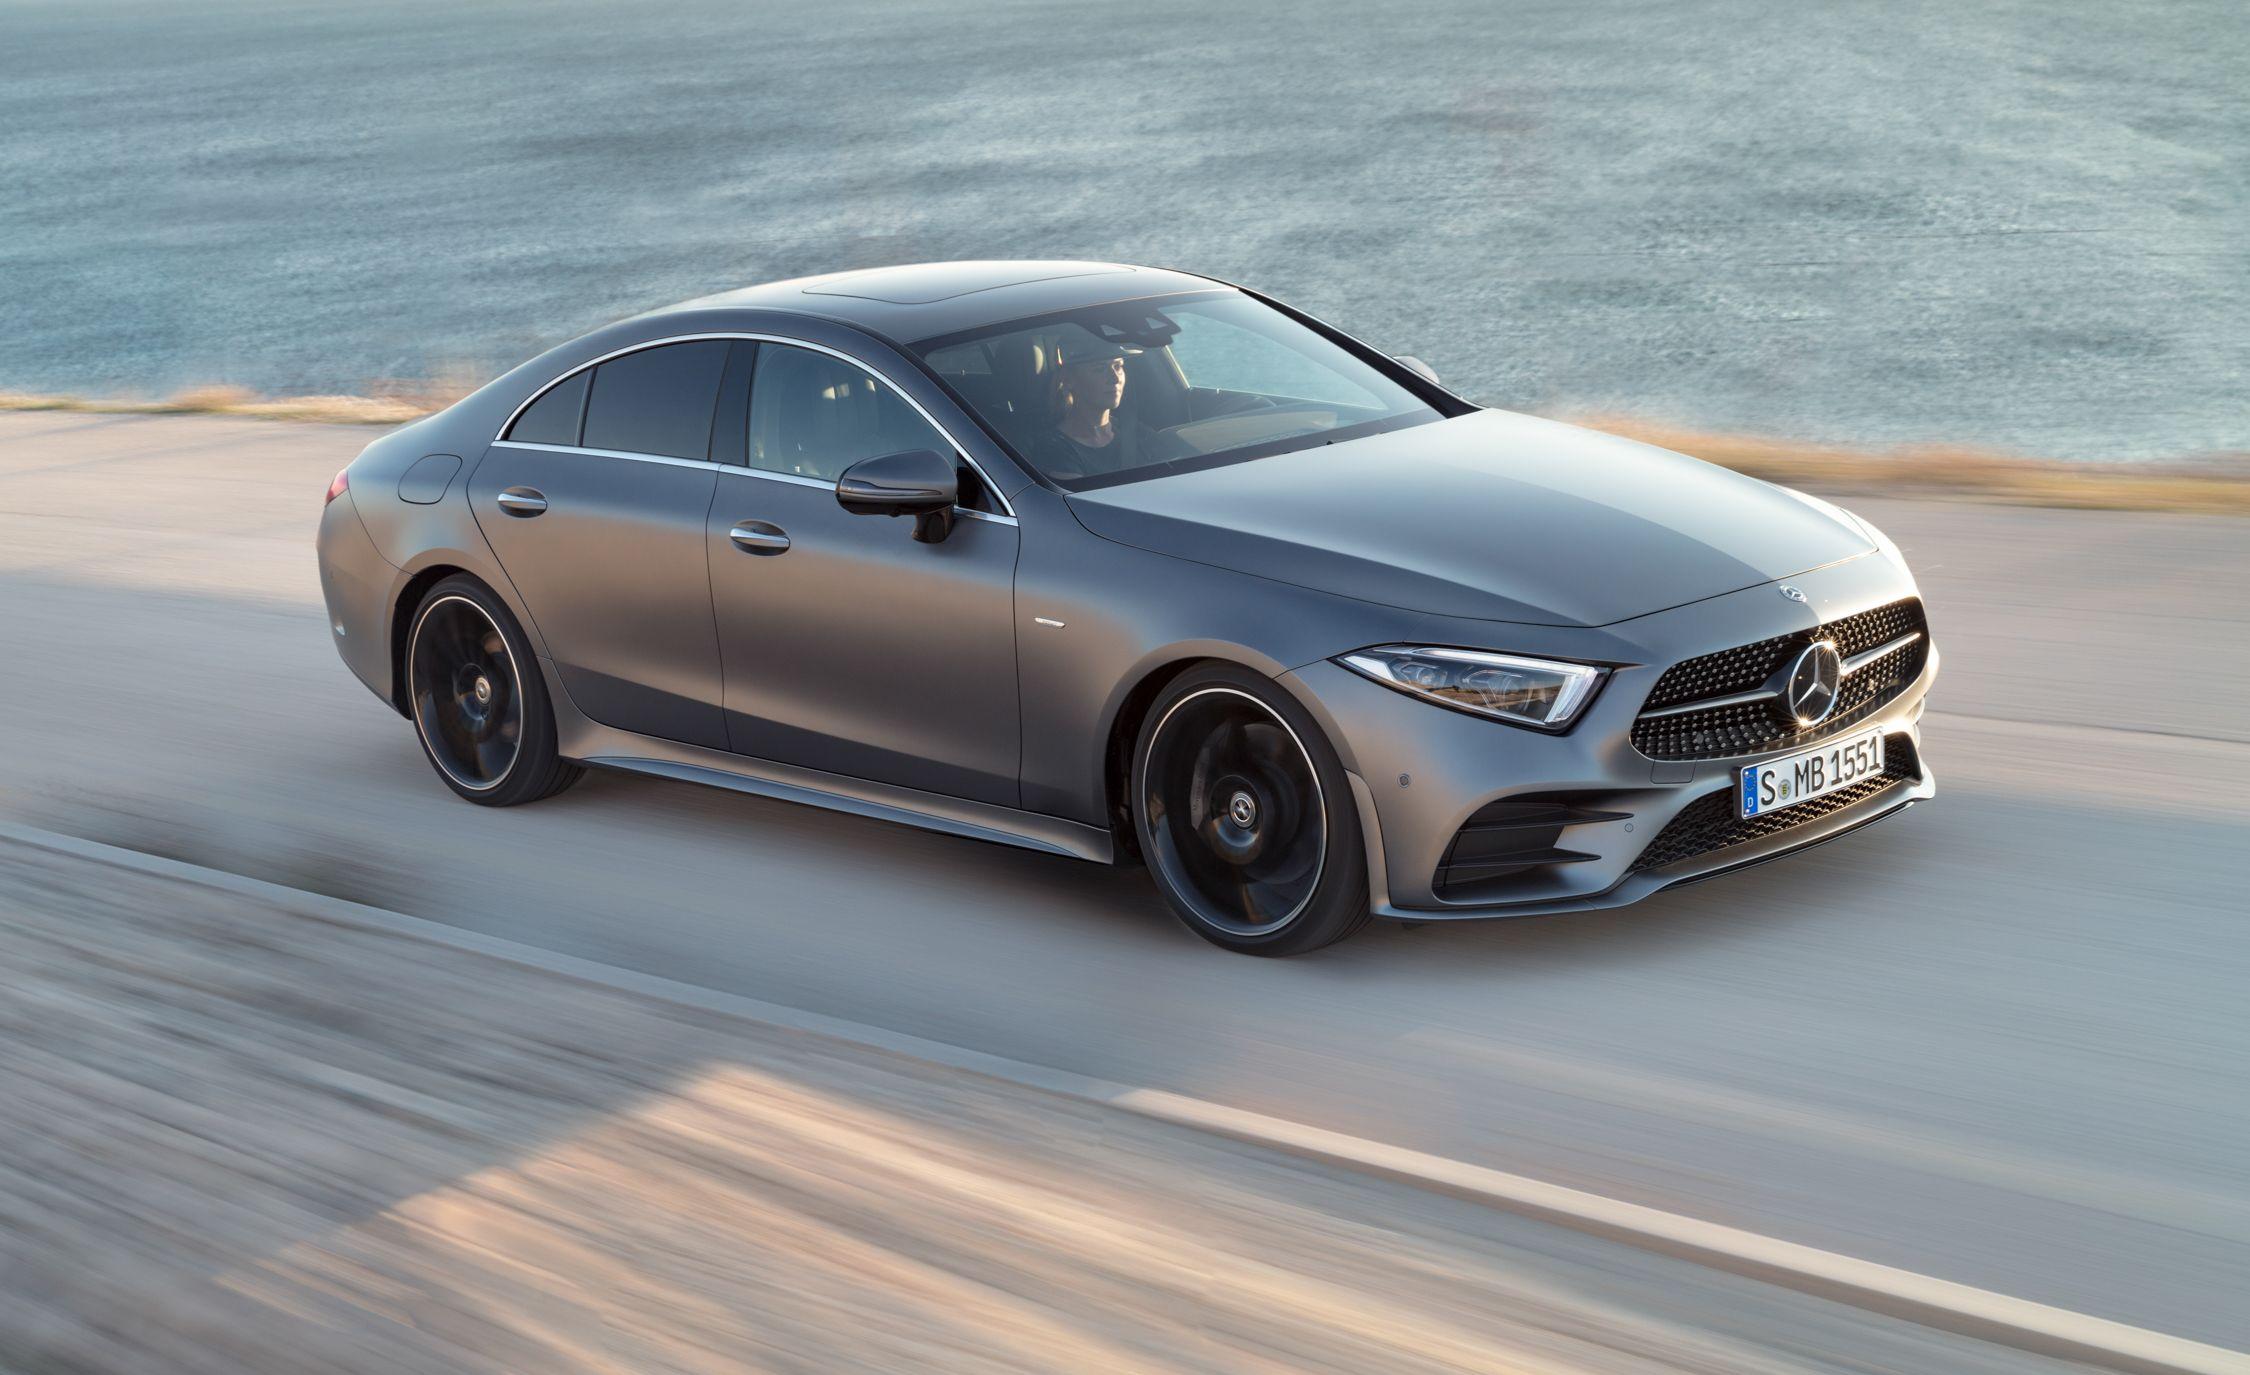 https://hips.hearstapps.com/amv-prod-cad-assets.s3.amazonaws.com/wp-content/uploads/2017/11/2019-Mercedes-Benz-CLS-class-110.jpg